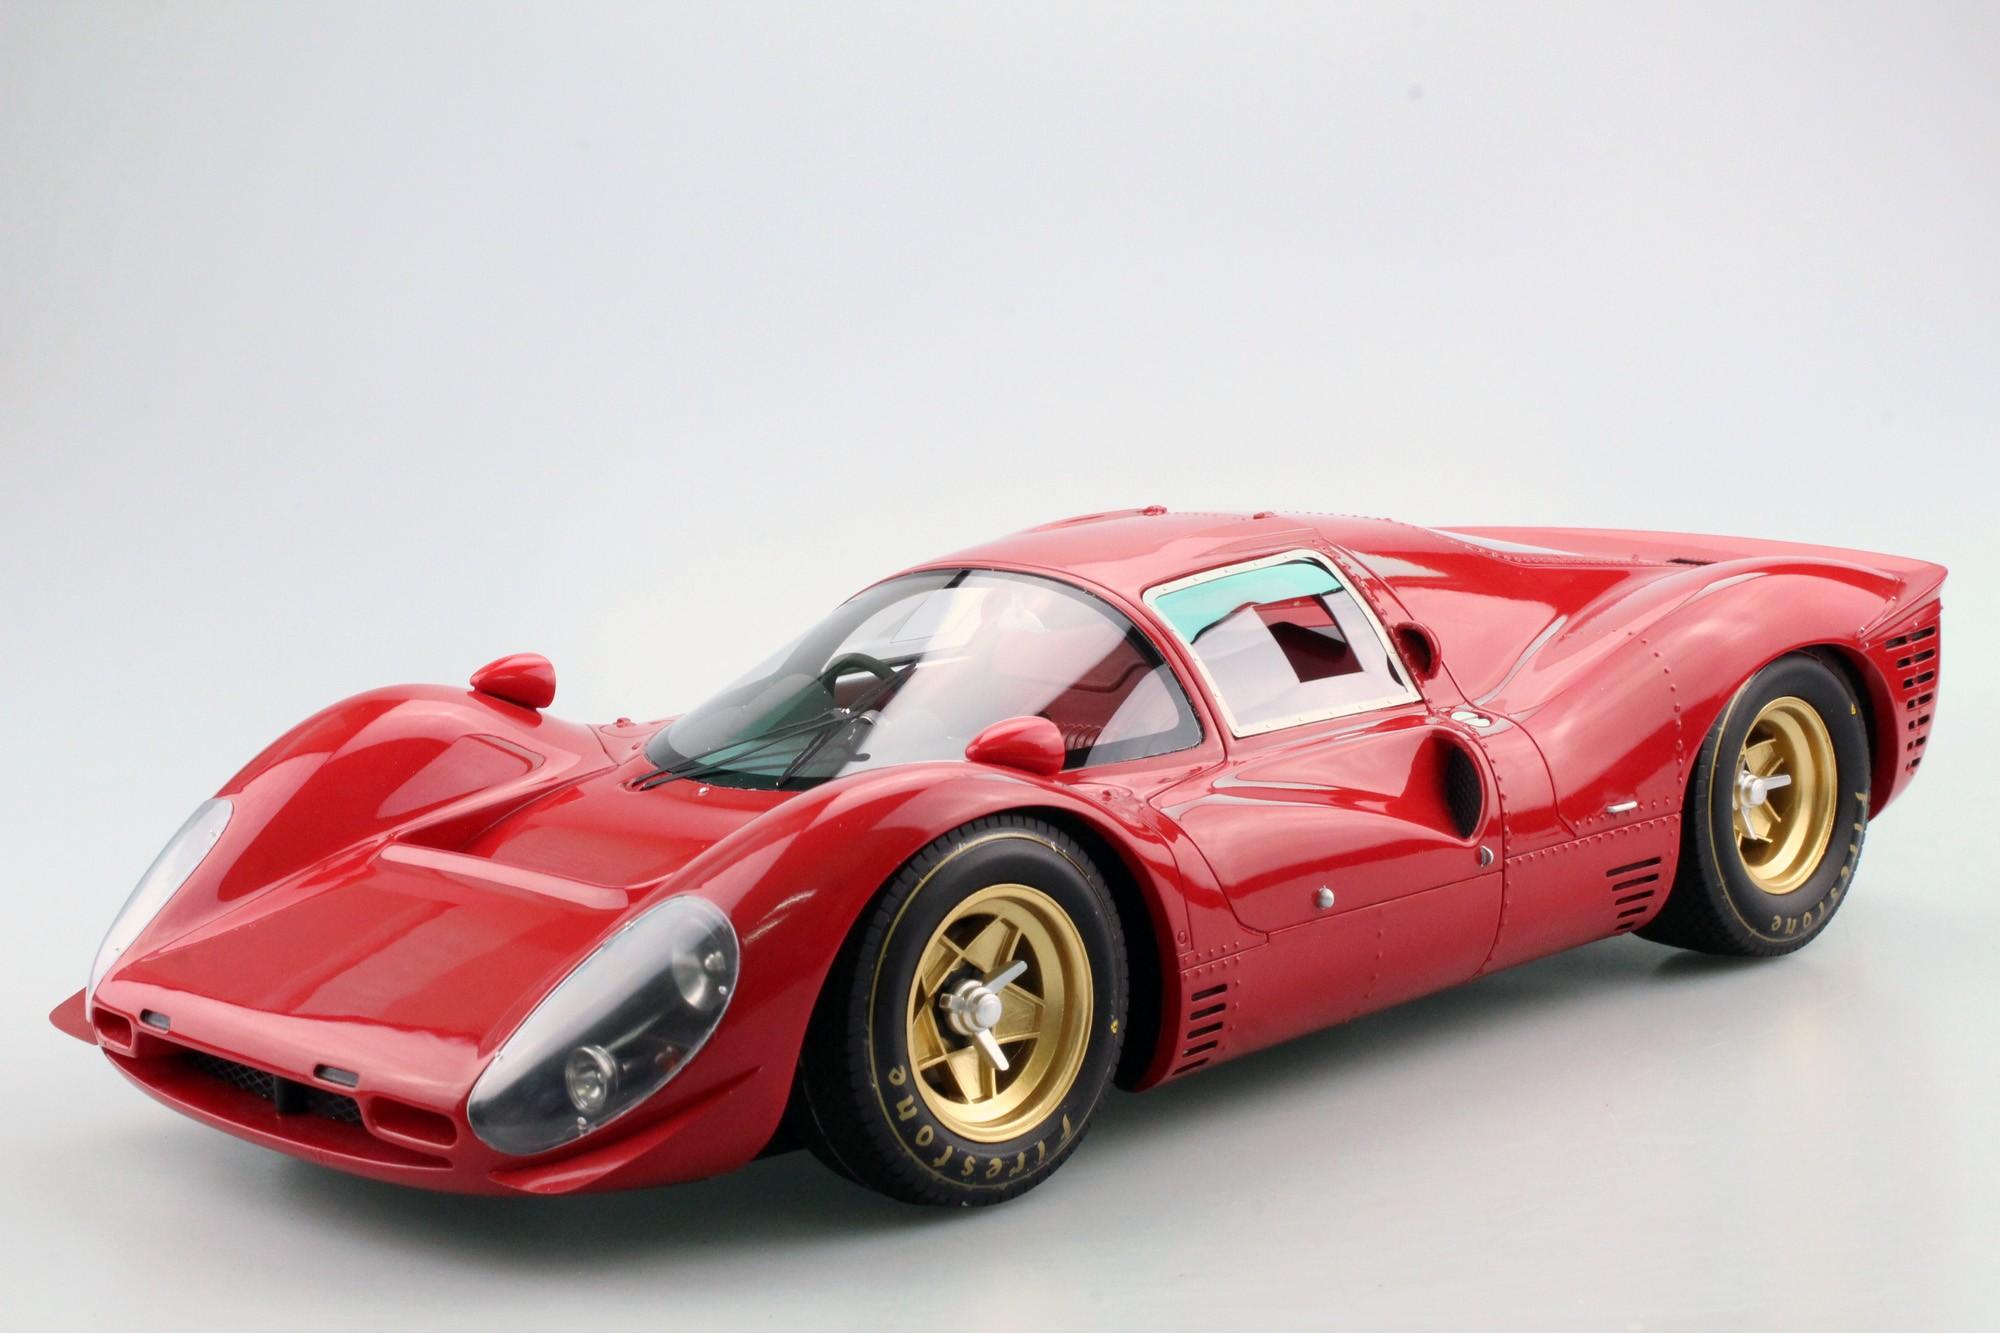 Gp Replicas Ferrari 330 P4 Plain Red Pre Order 1 12 Rot Gp12 09d